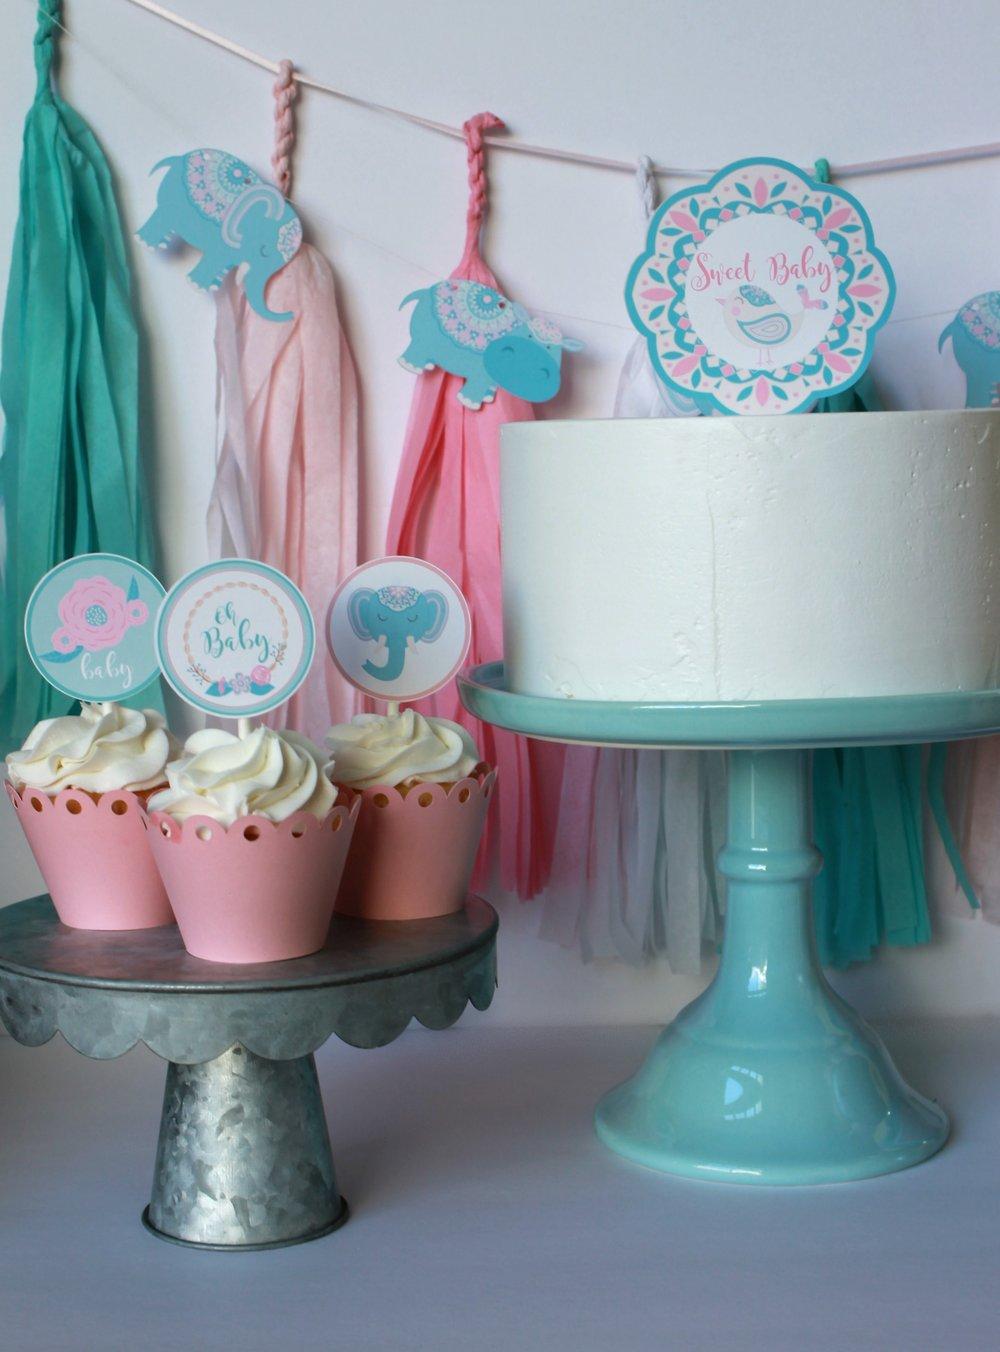 Sweet Baby Topper-Boho Baby Shower-www.SugarPartiesla.com.jpg